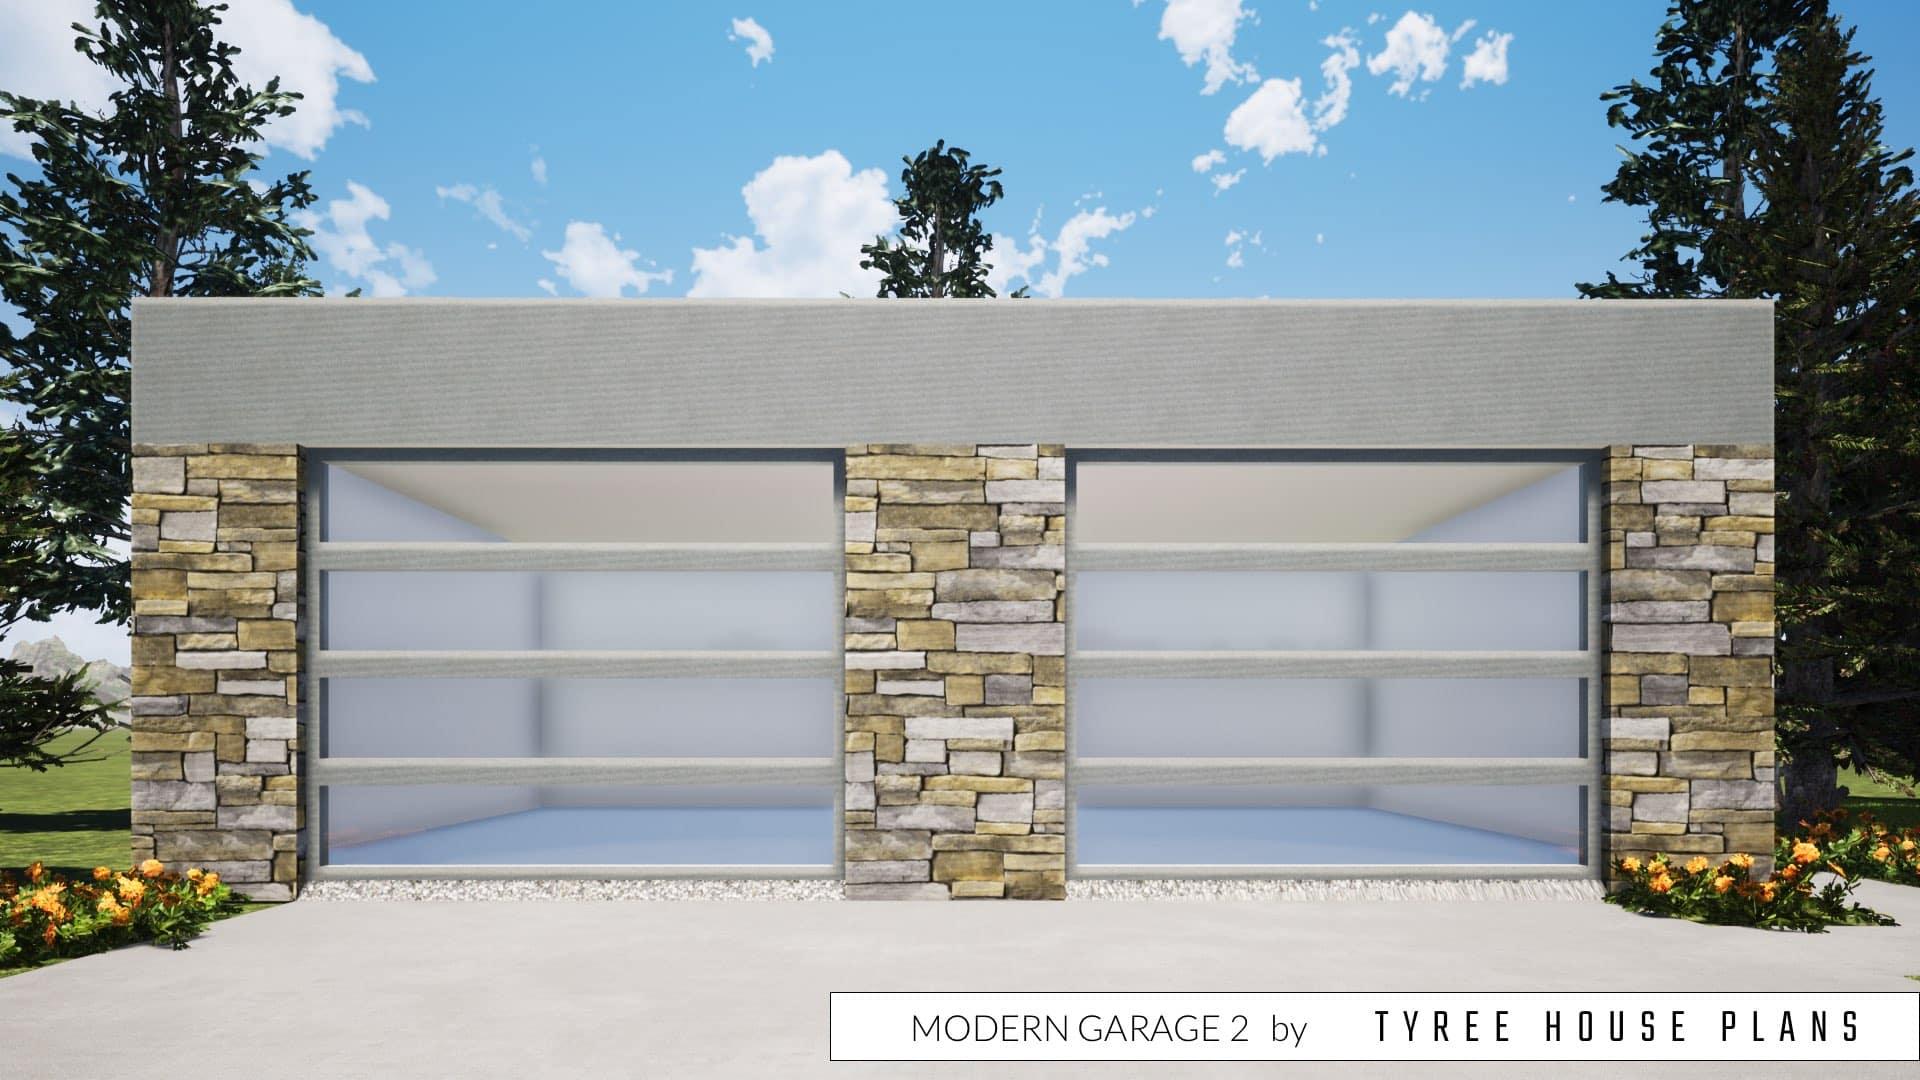 Modern Garage 2 Plan by Tyree House Plans